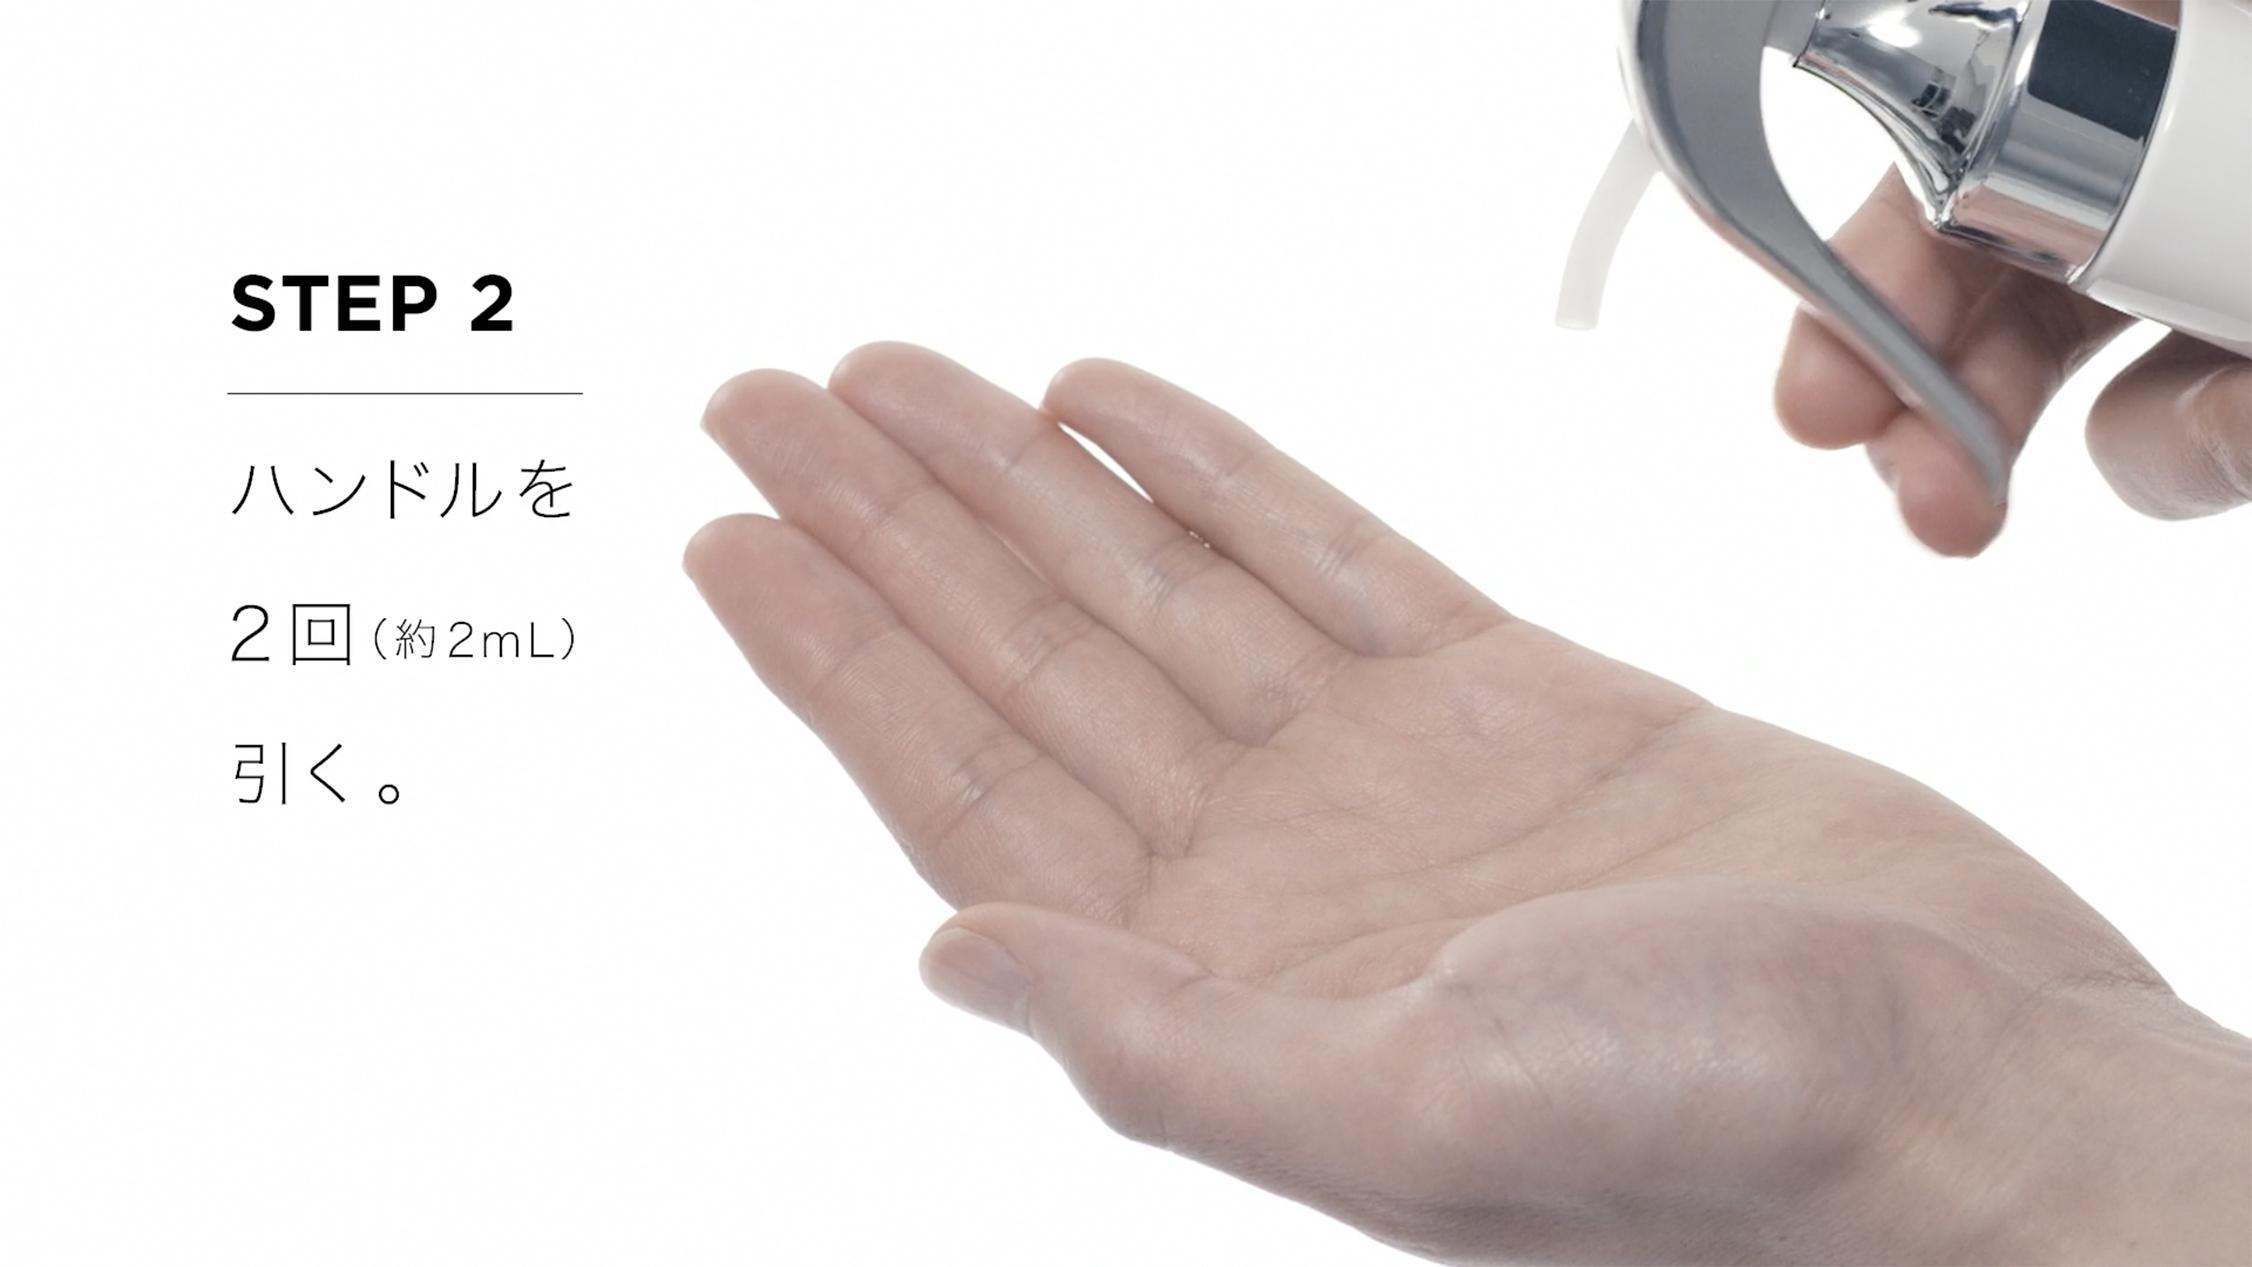 TYME/LISSAGE-Image-003